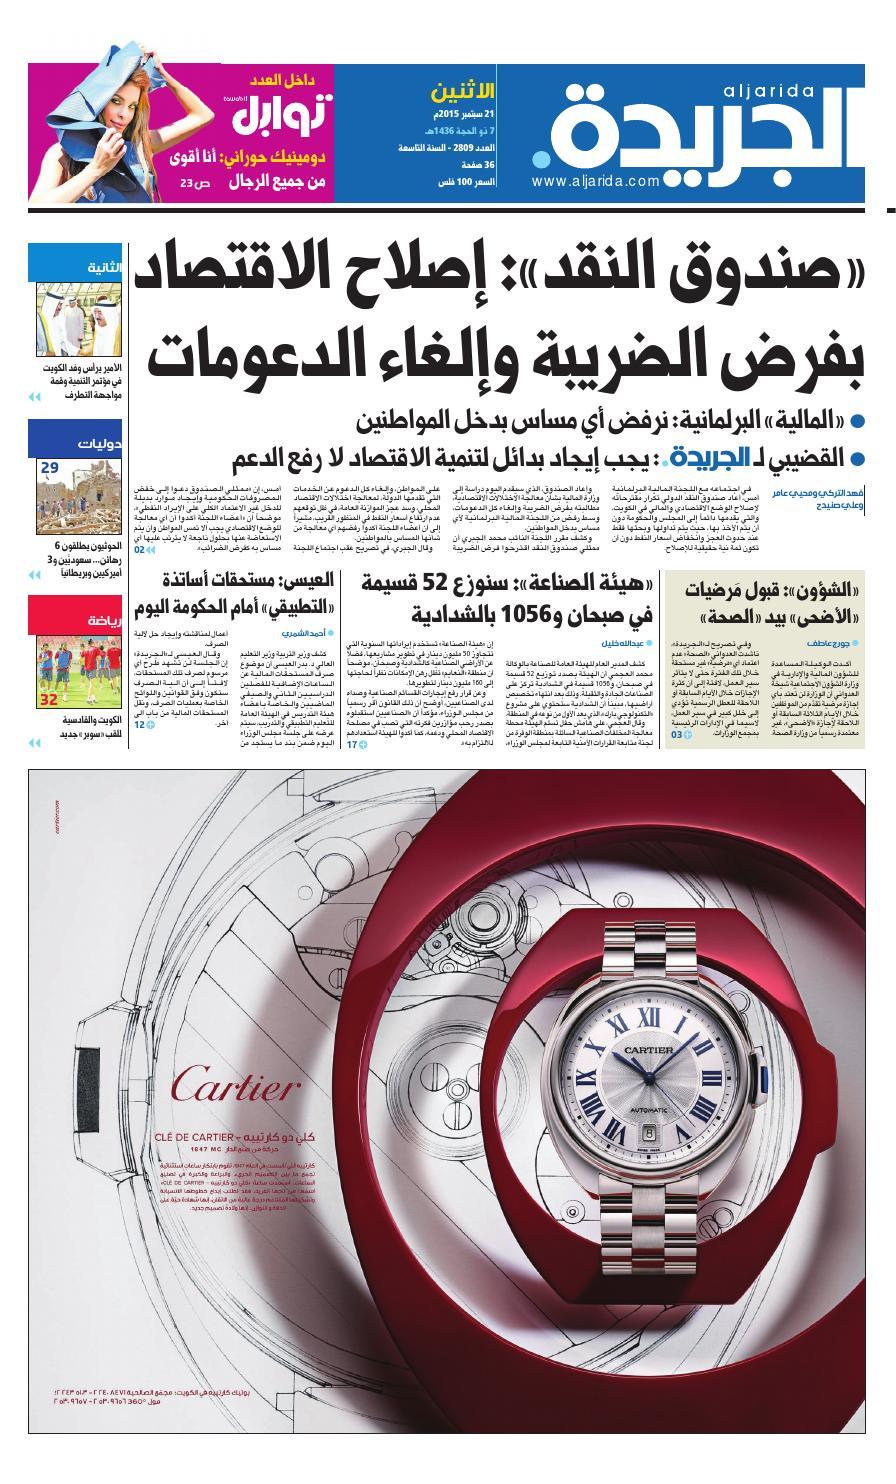 451a92c97 عدد الجريدة 21 سبتمبر 2015 by Aljarida Newspaper - issuu